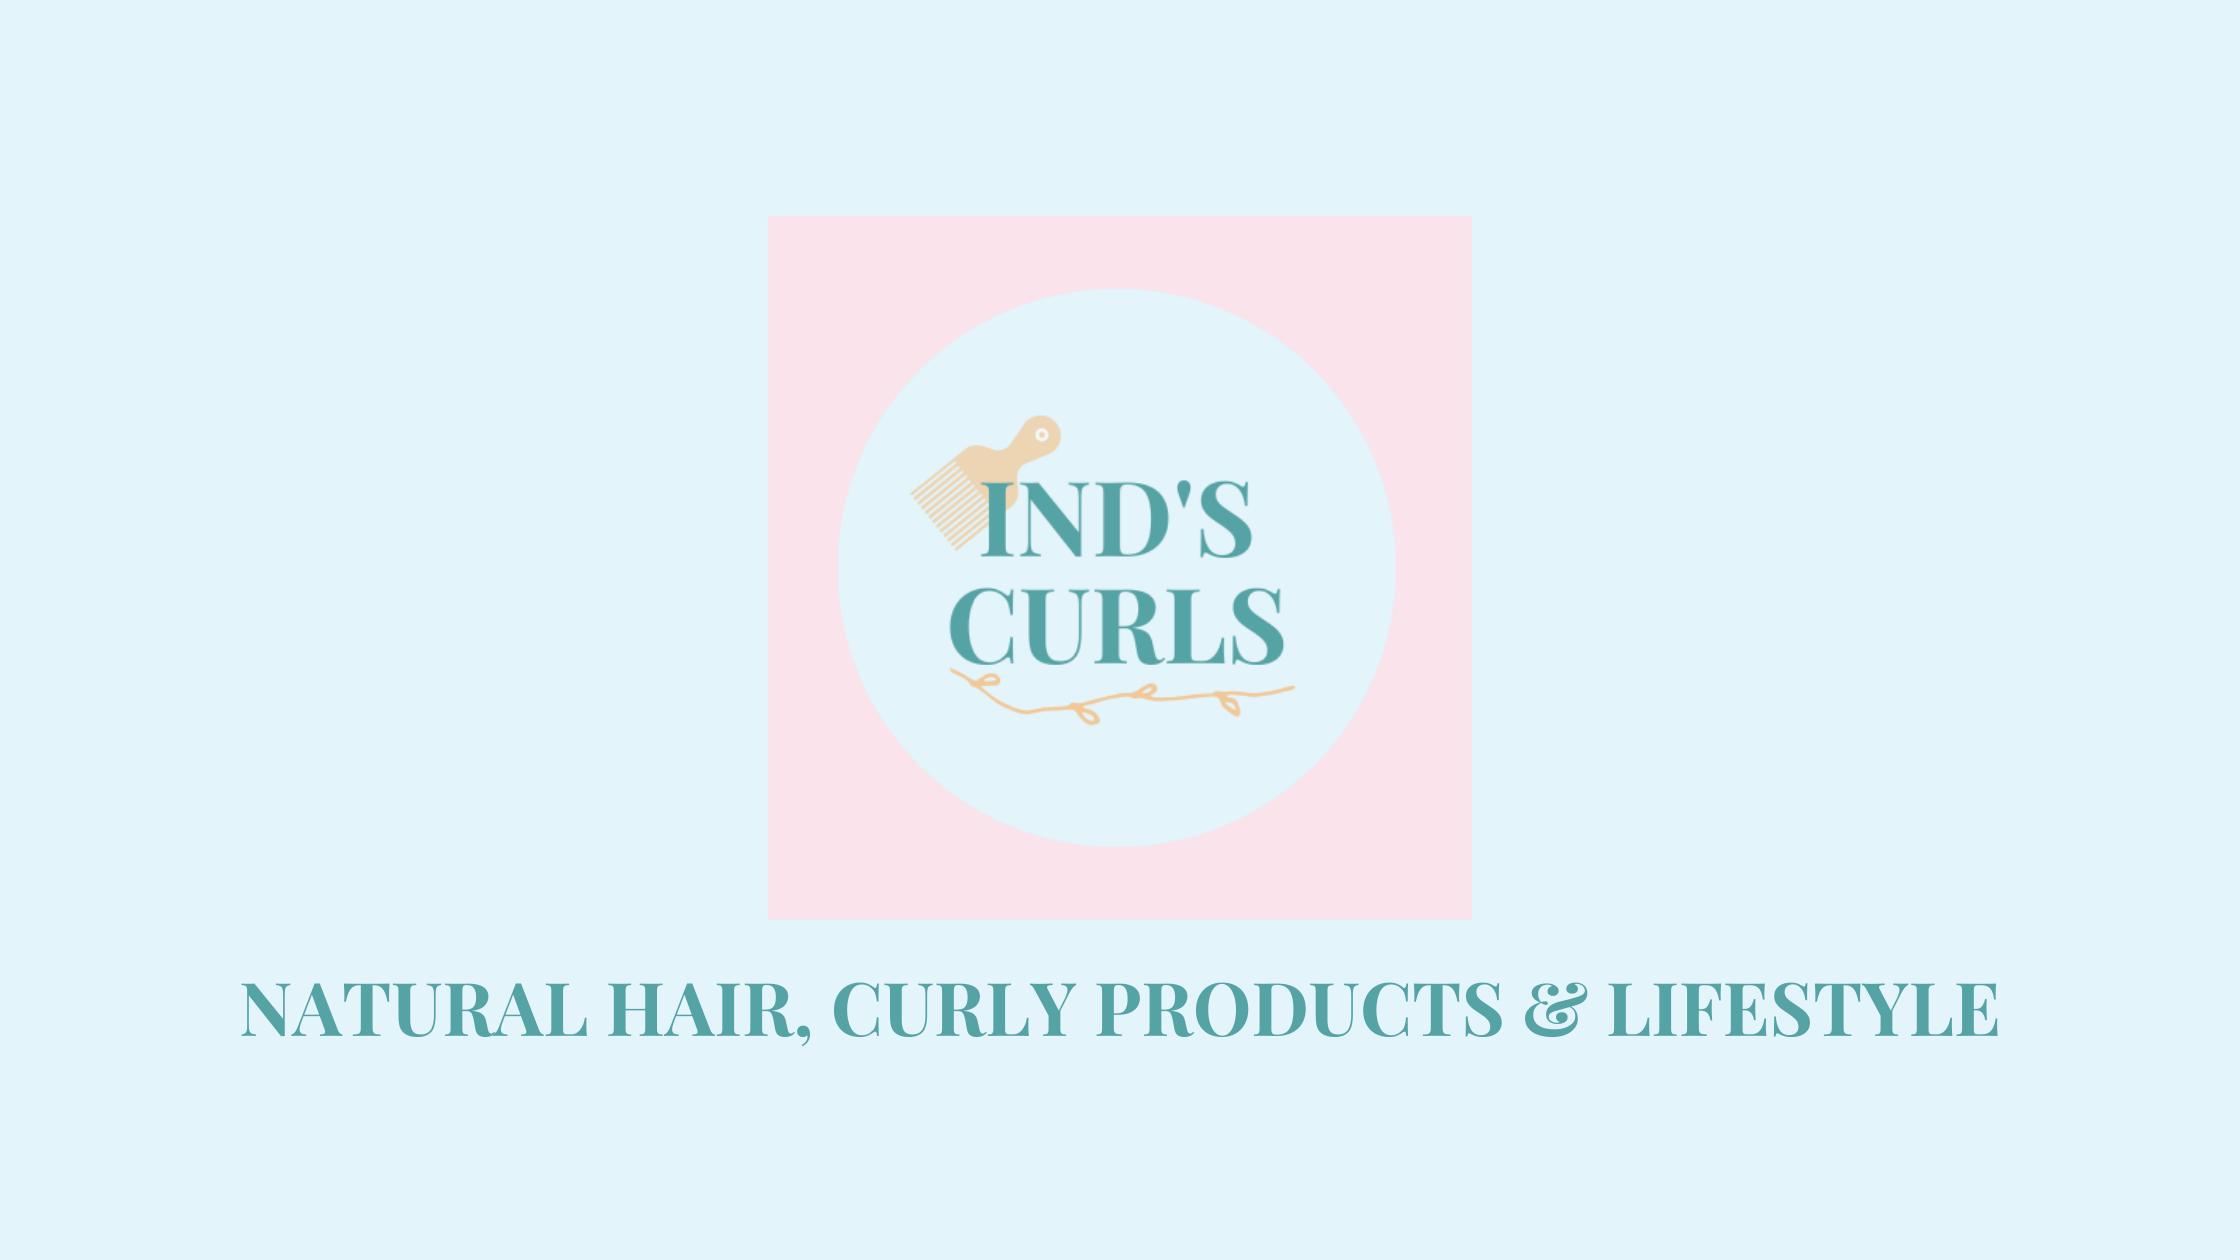 Ind's Curls